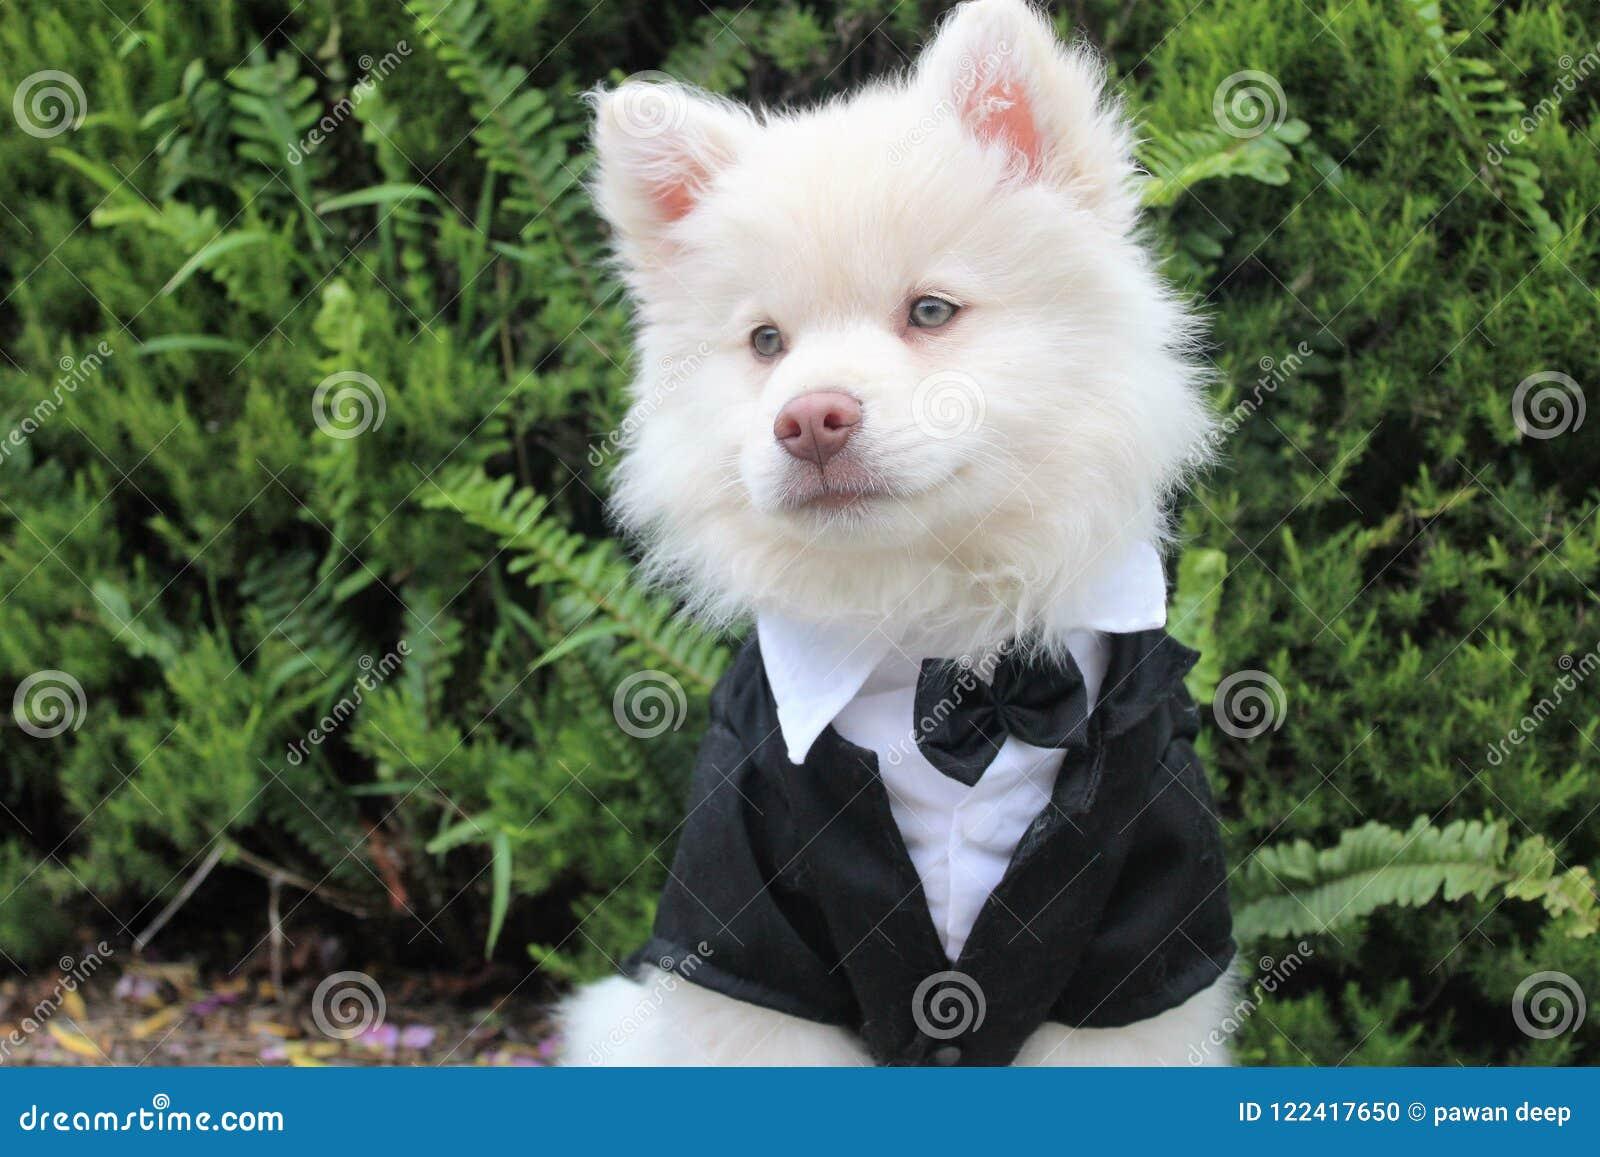 Cute Beautiful White Dog Stock Photo Image Of Cute 122417650